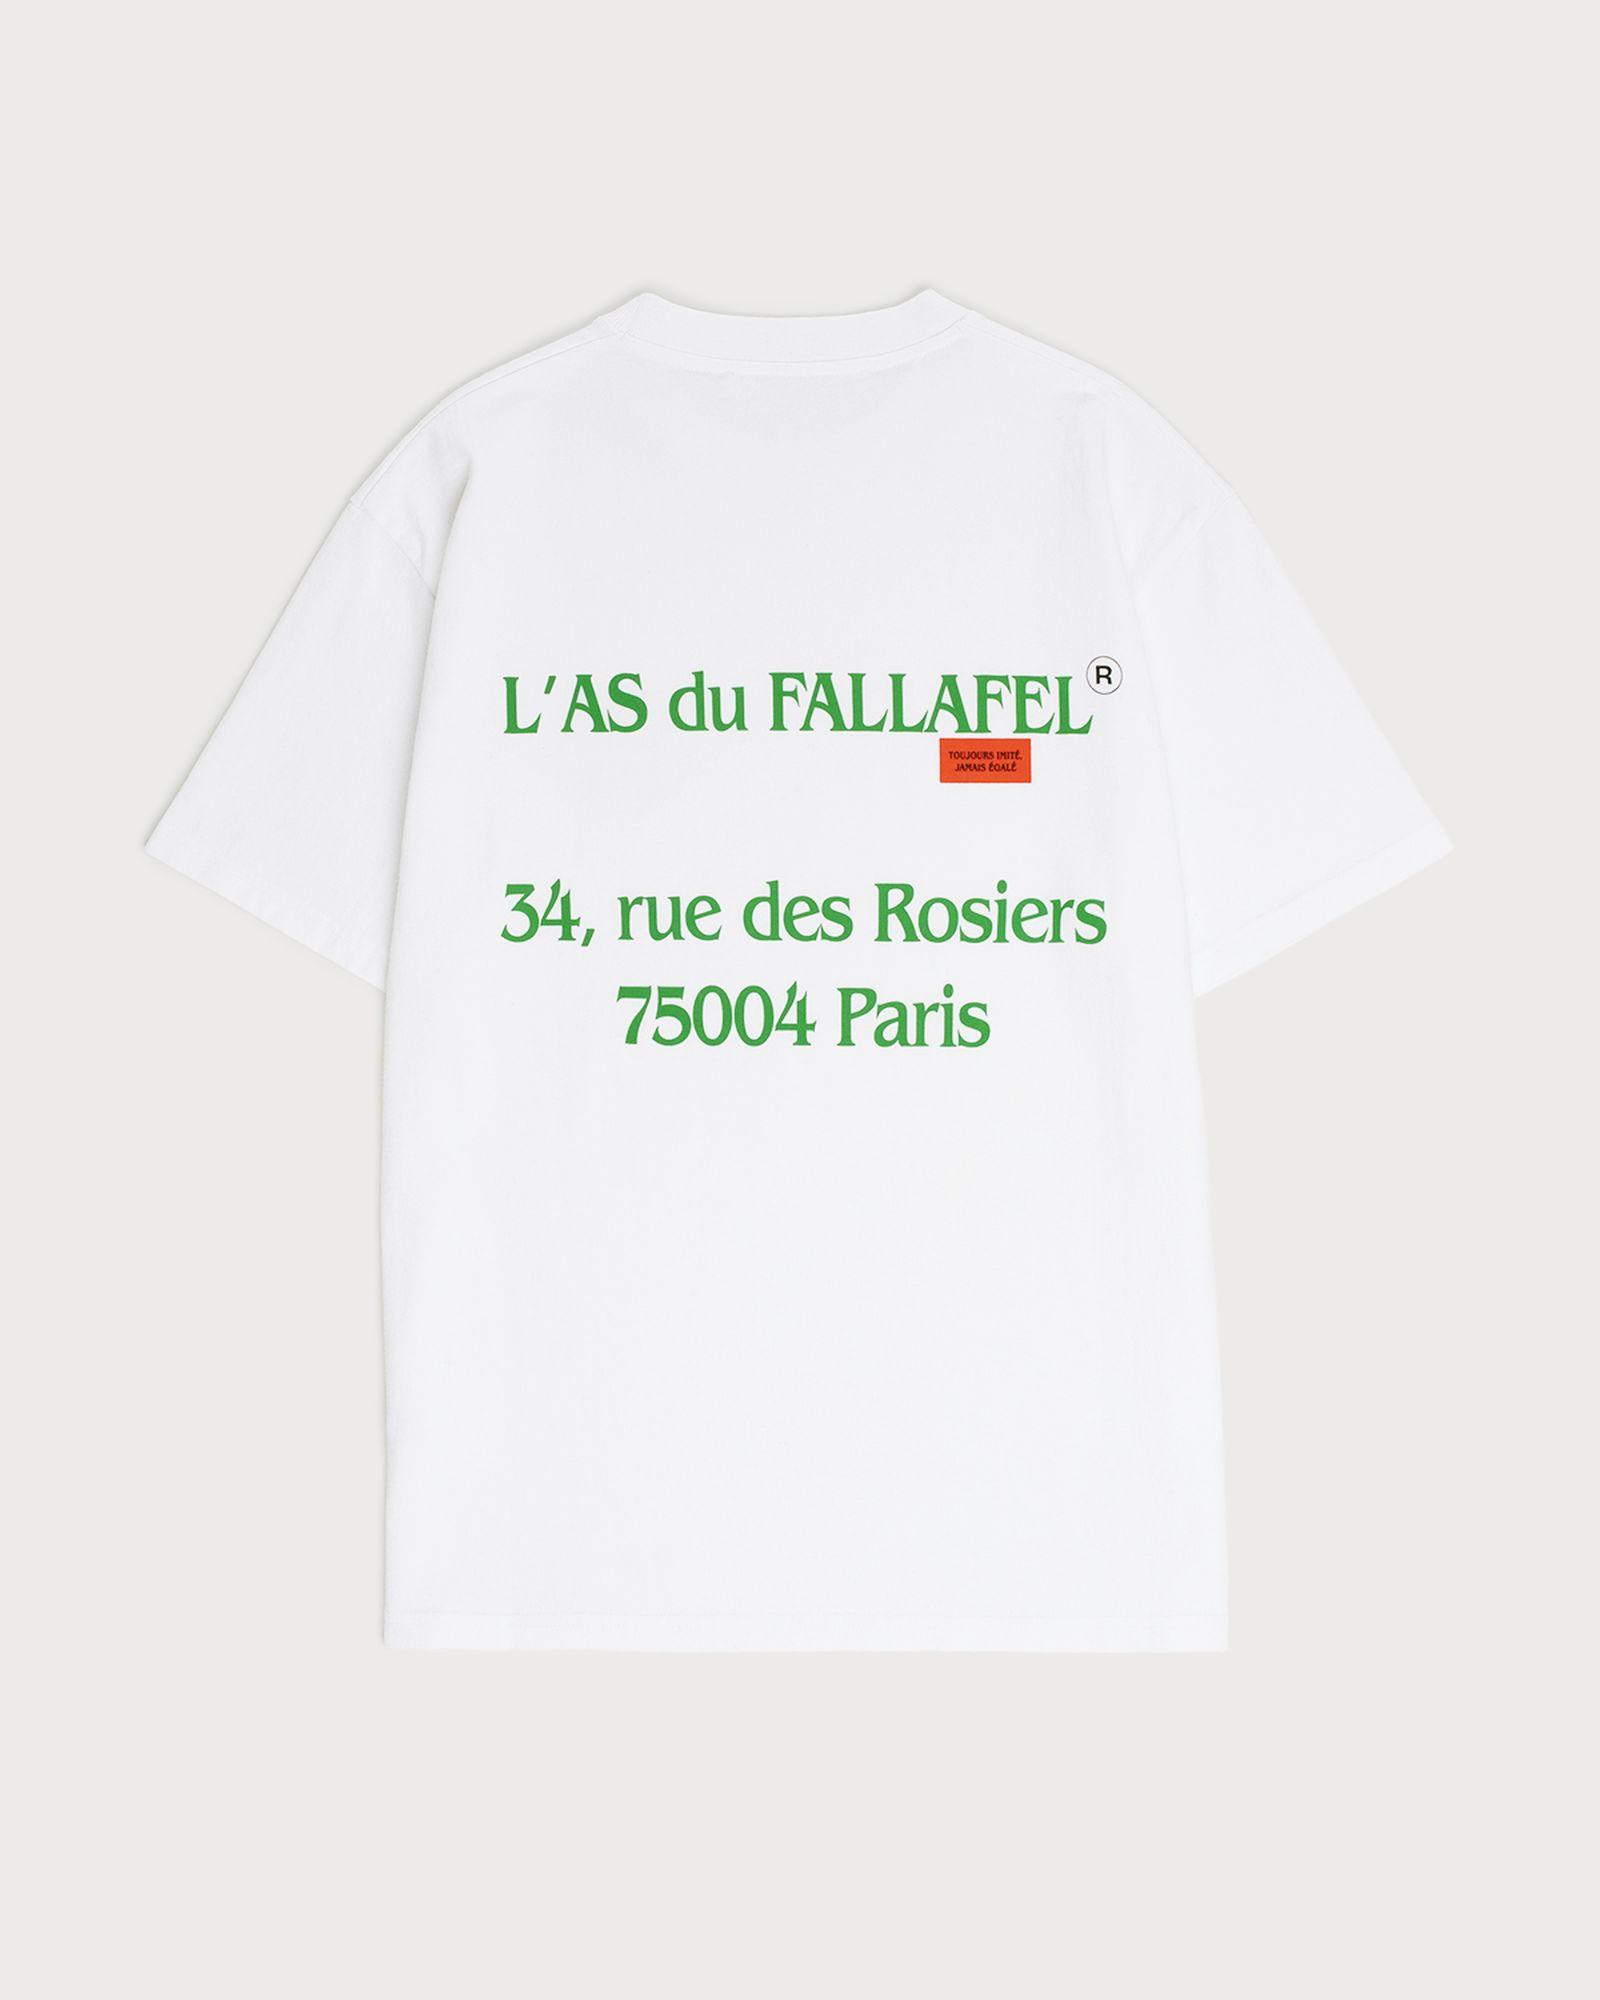 highsnobiety-las-du-fallafel-collection-04